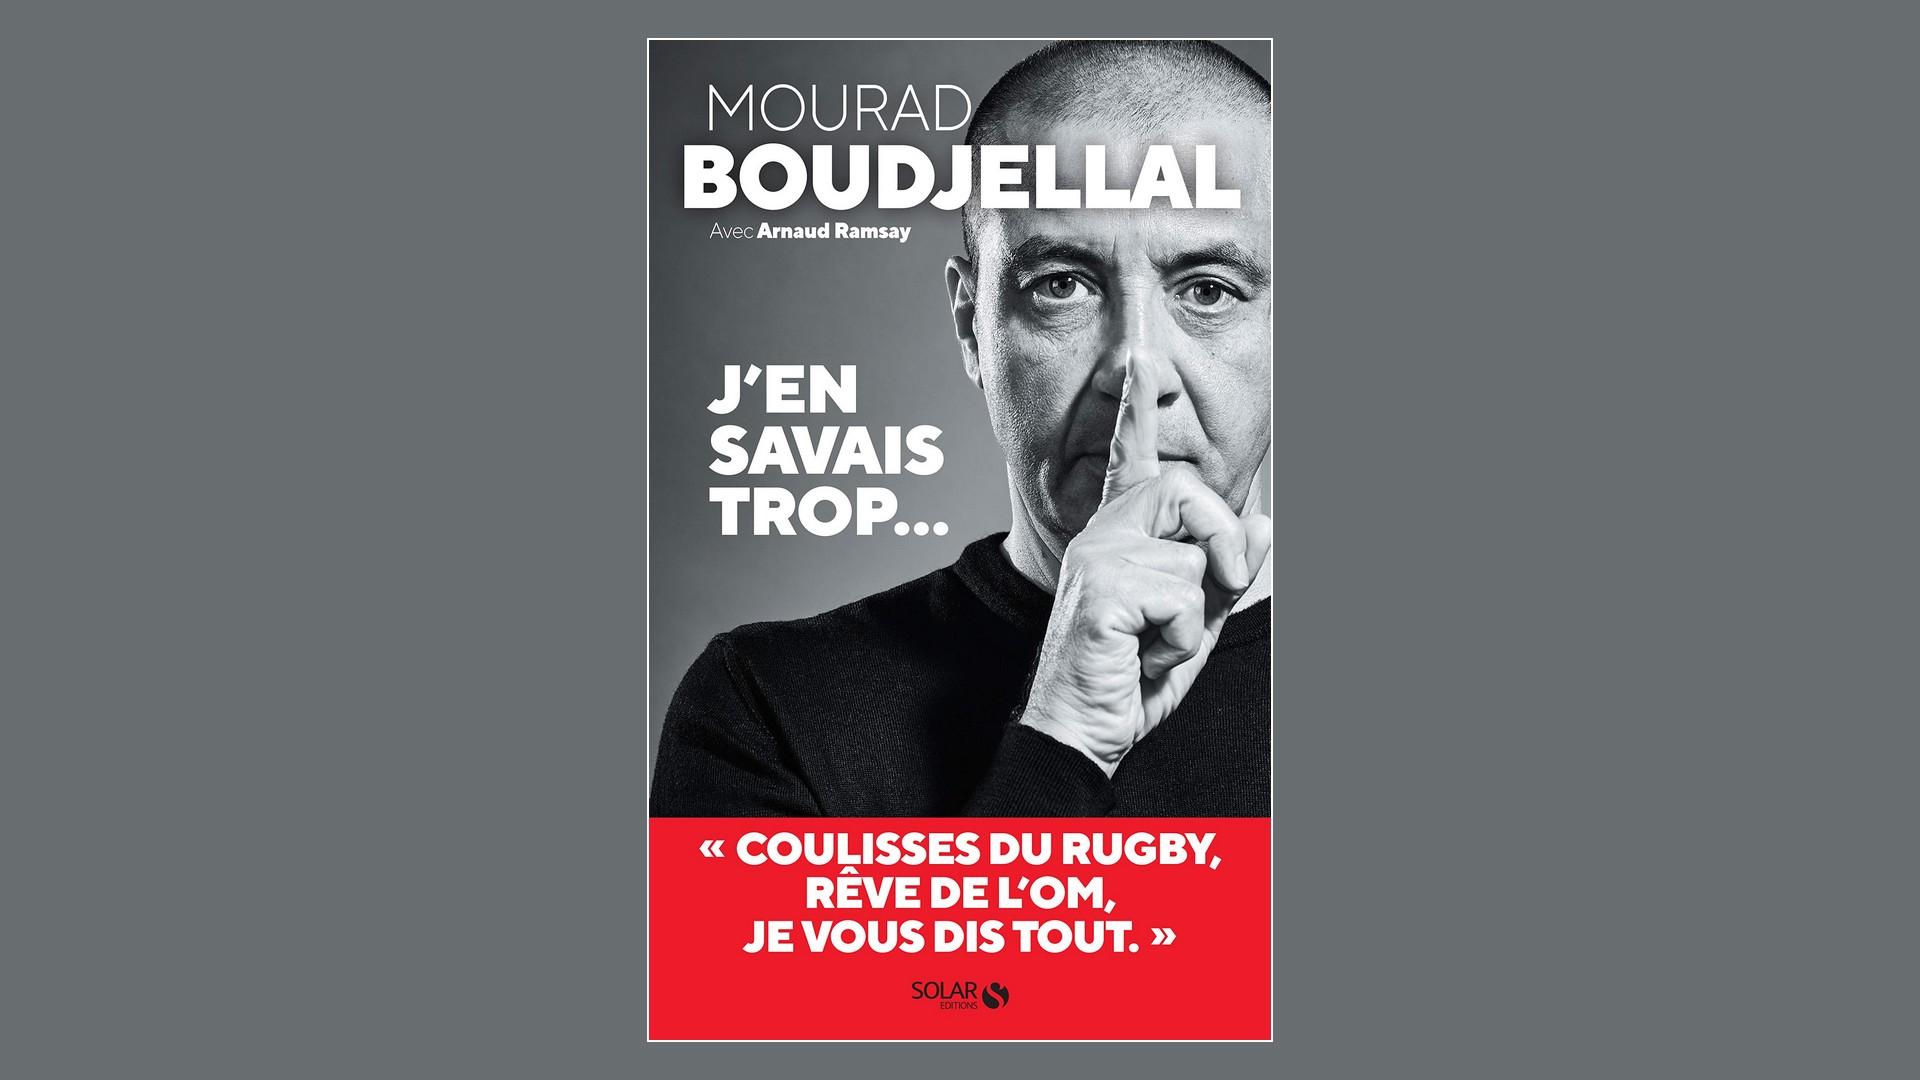 Livres – J'en savais trop – Mourad Boudjellal (2020)